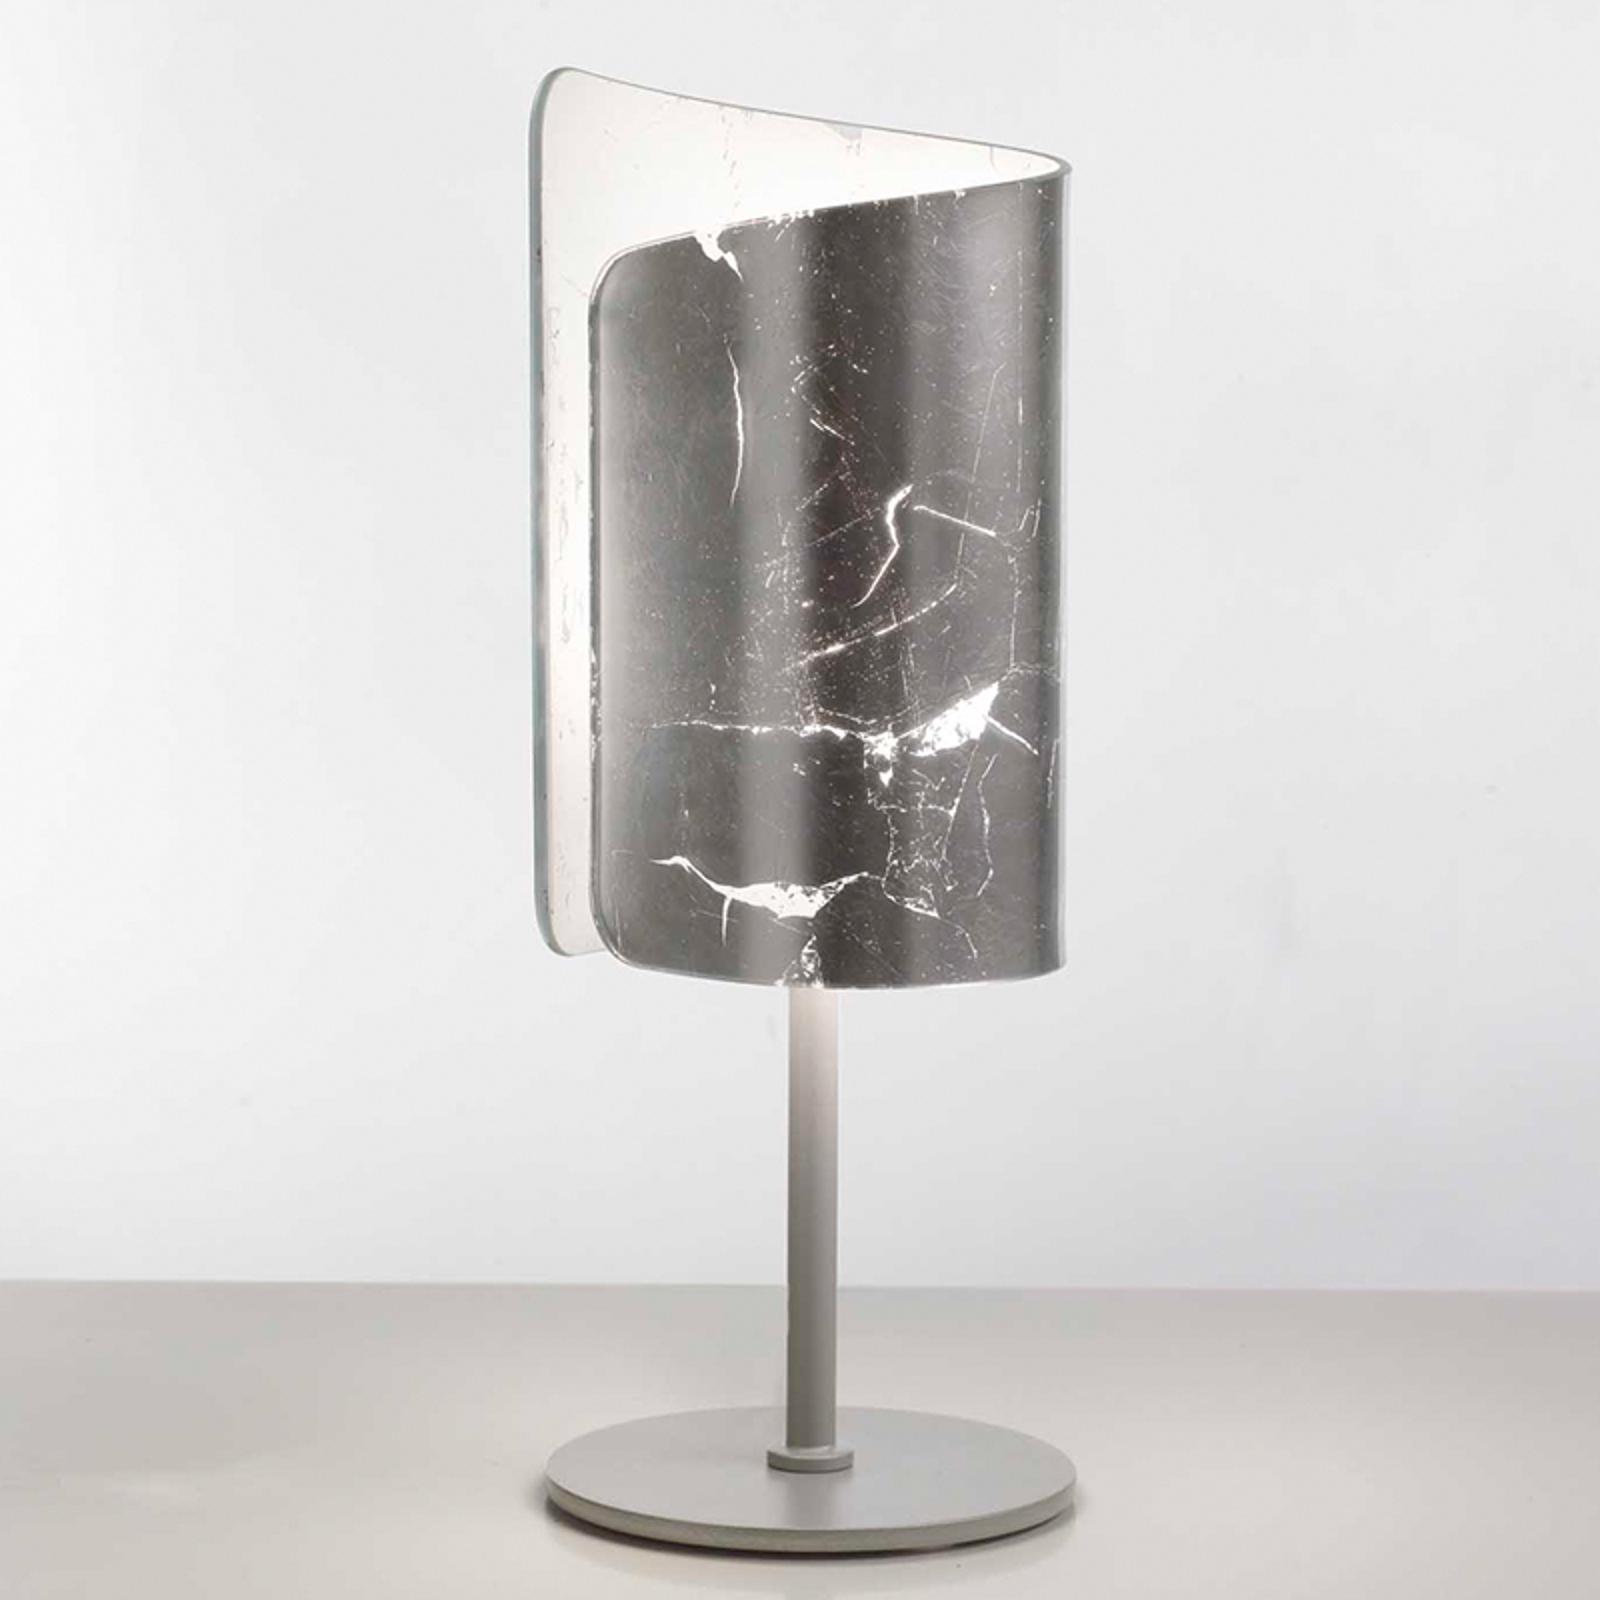 Leuke tafellamp Papiro, zilverkleurig